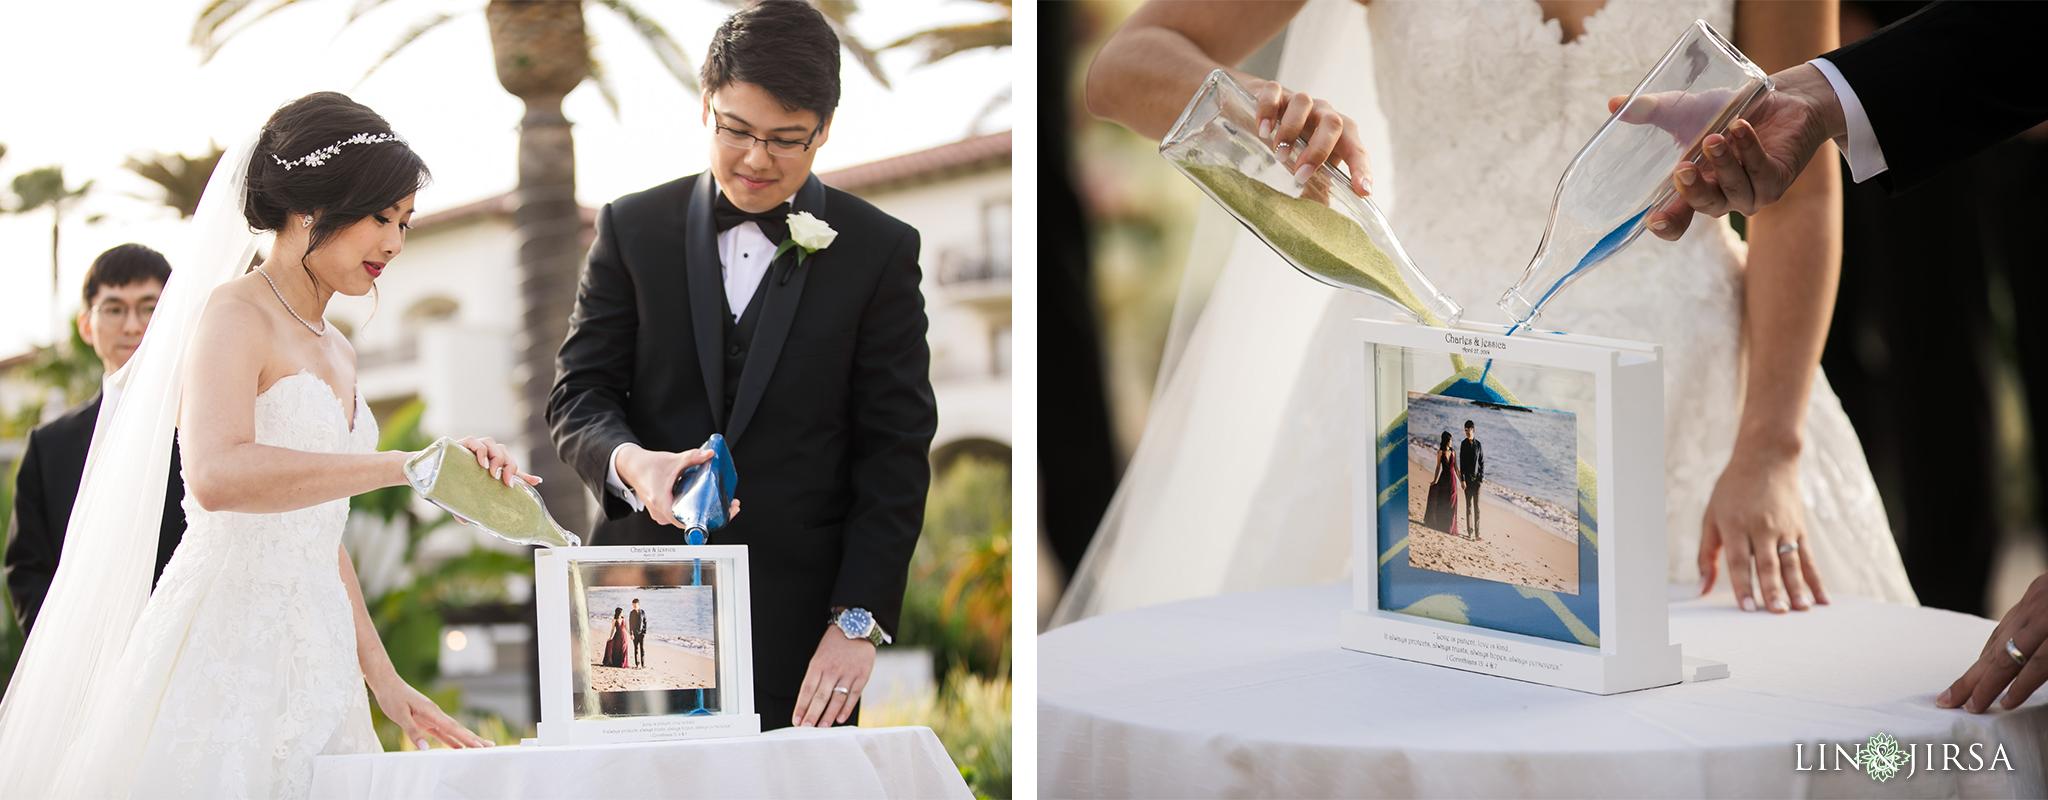 24 Monarch Beach Resort Dana Point Wedding Photography